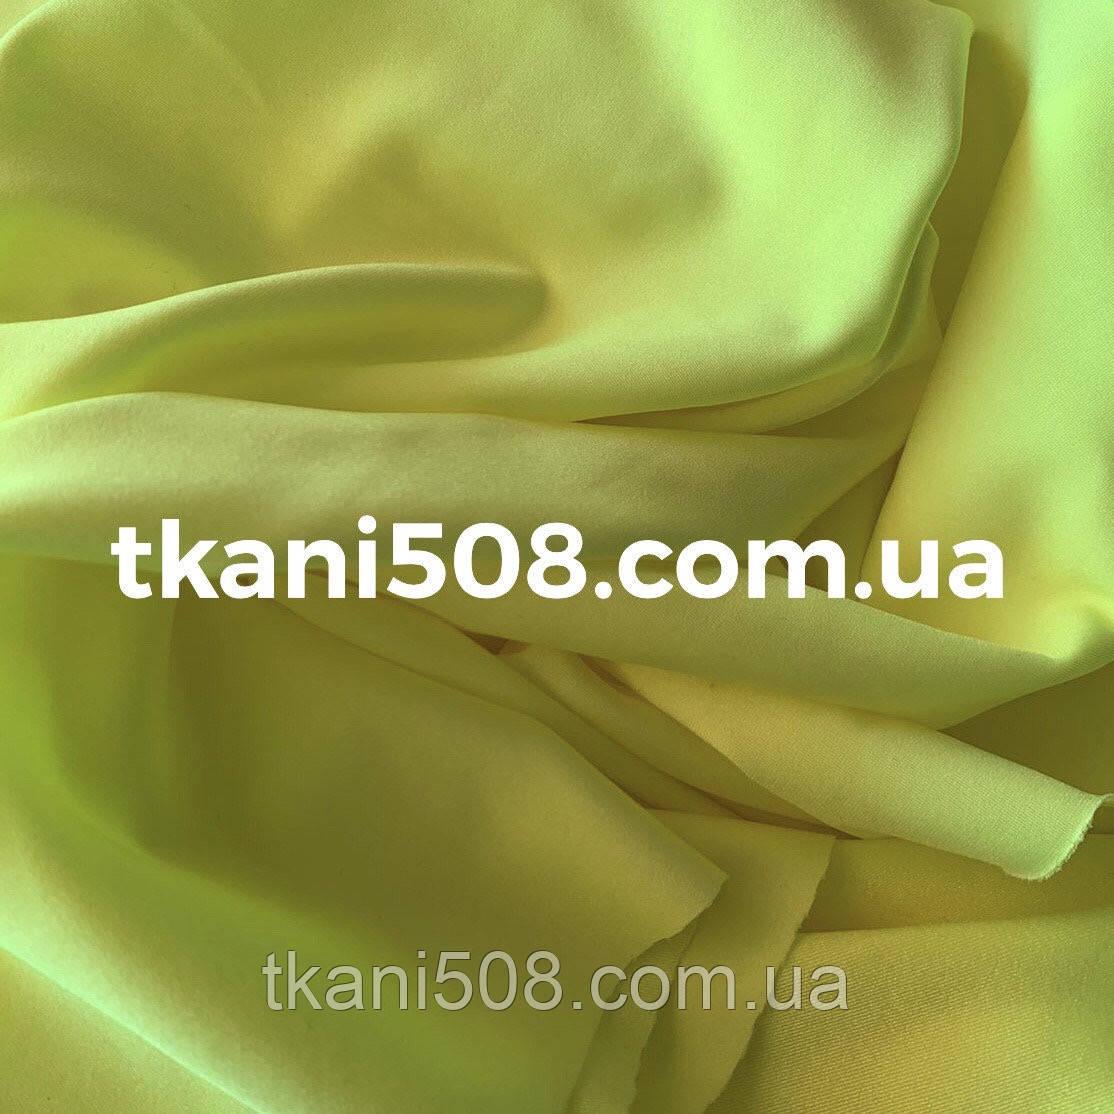 Бифлекс однотонный (Жёлтый -Лимонный)